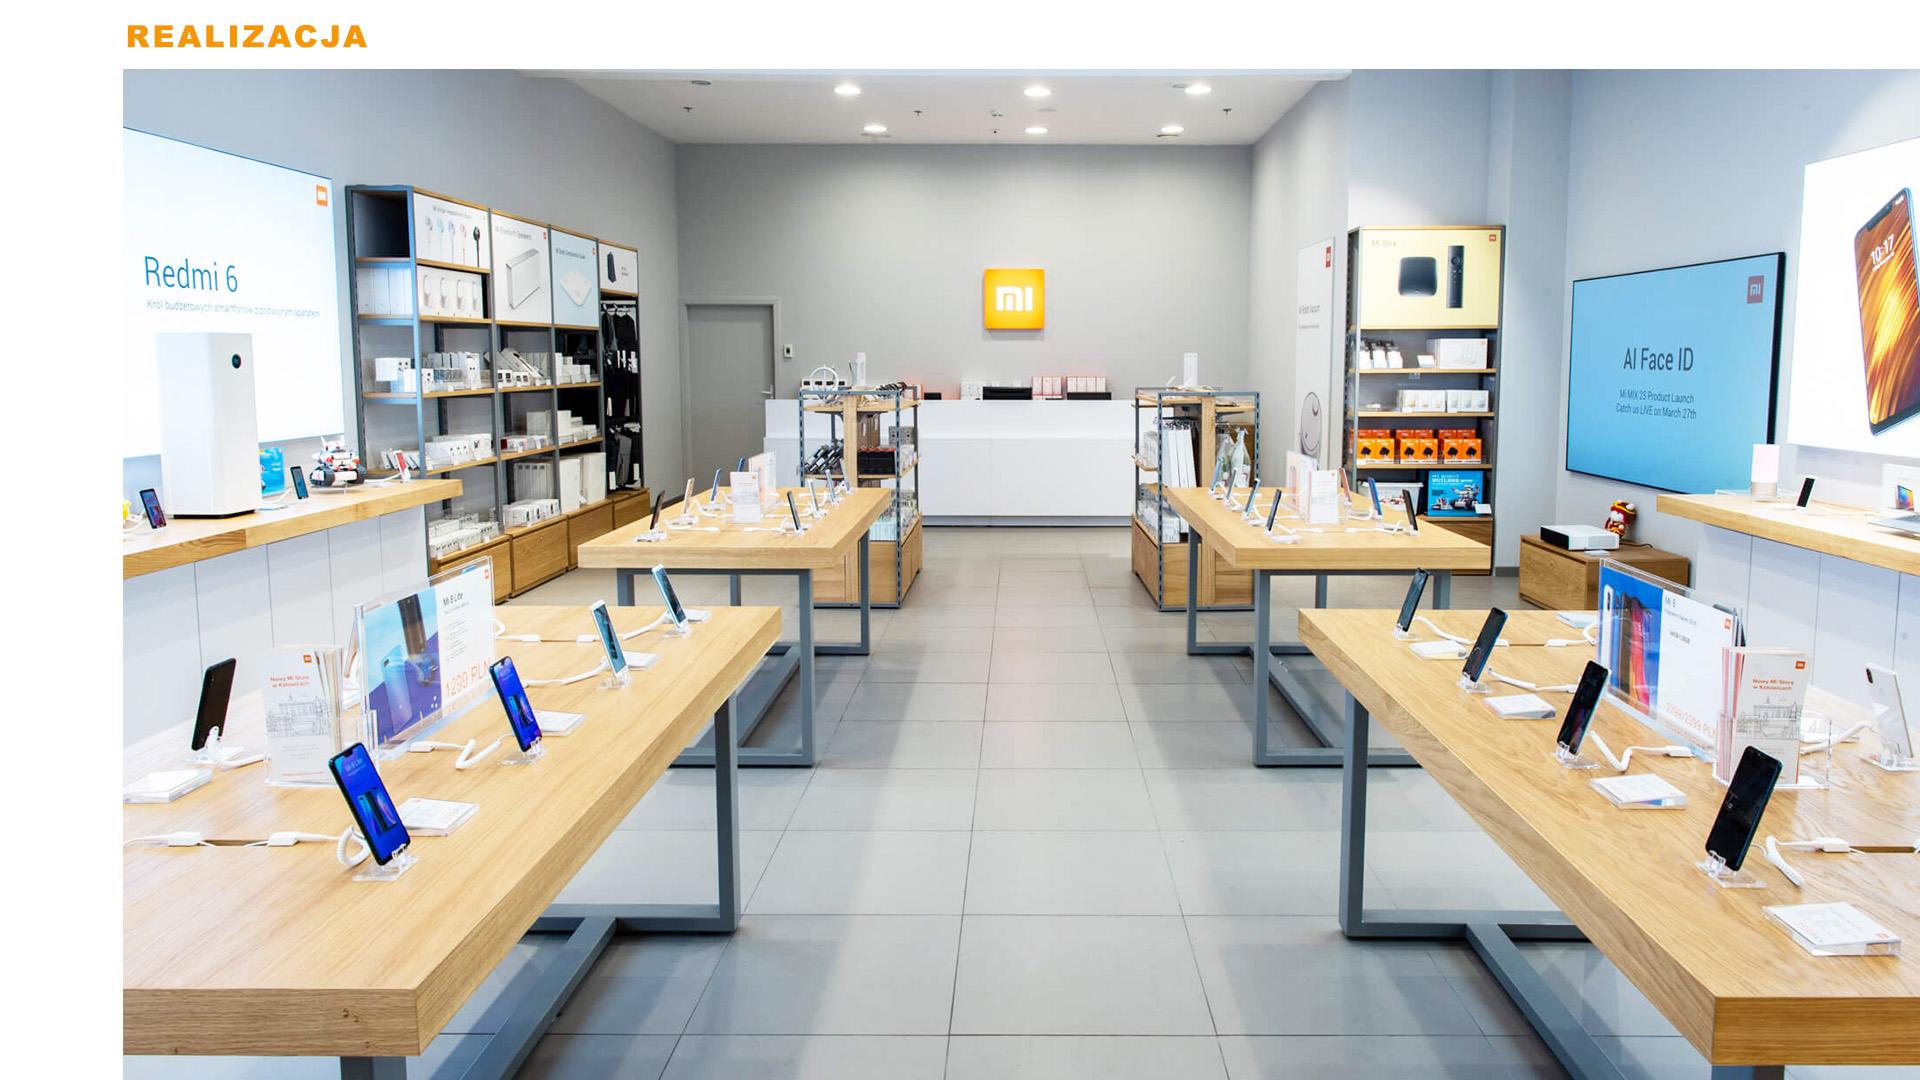 Mi-Store - Katowice - Galeria Katowicka - realizacja